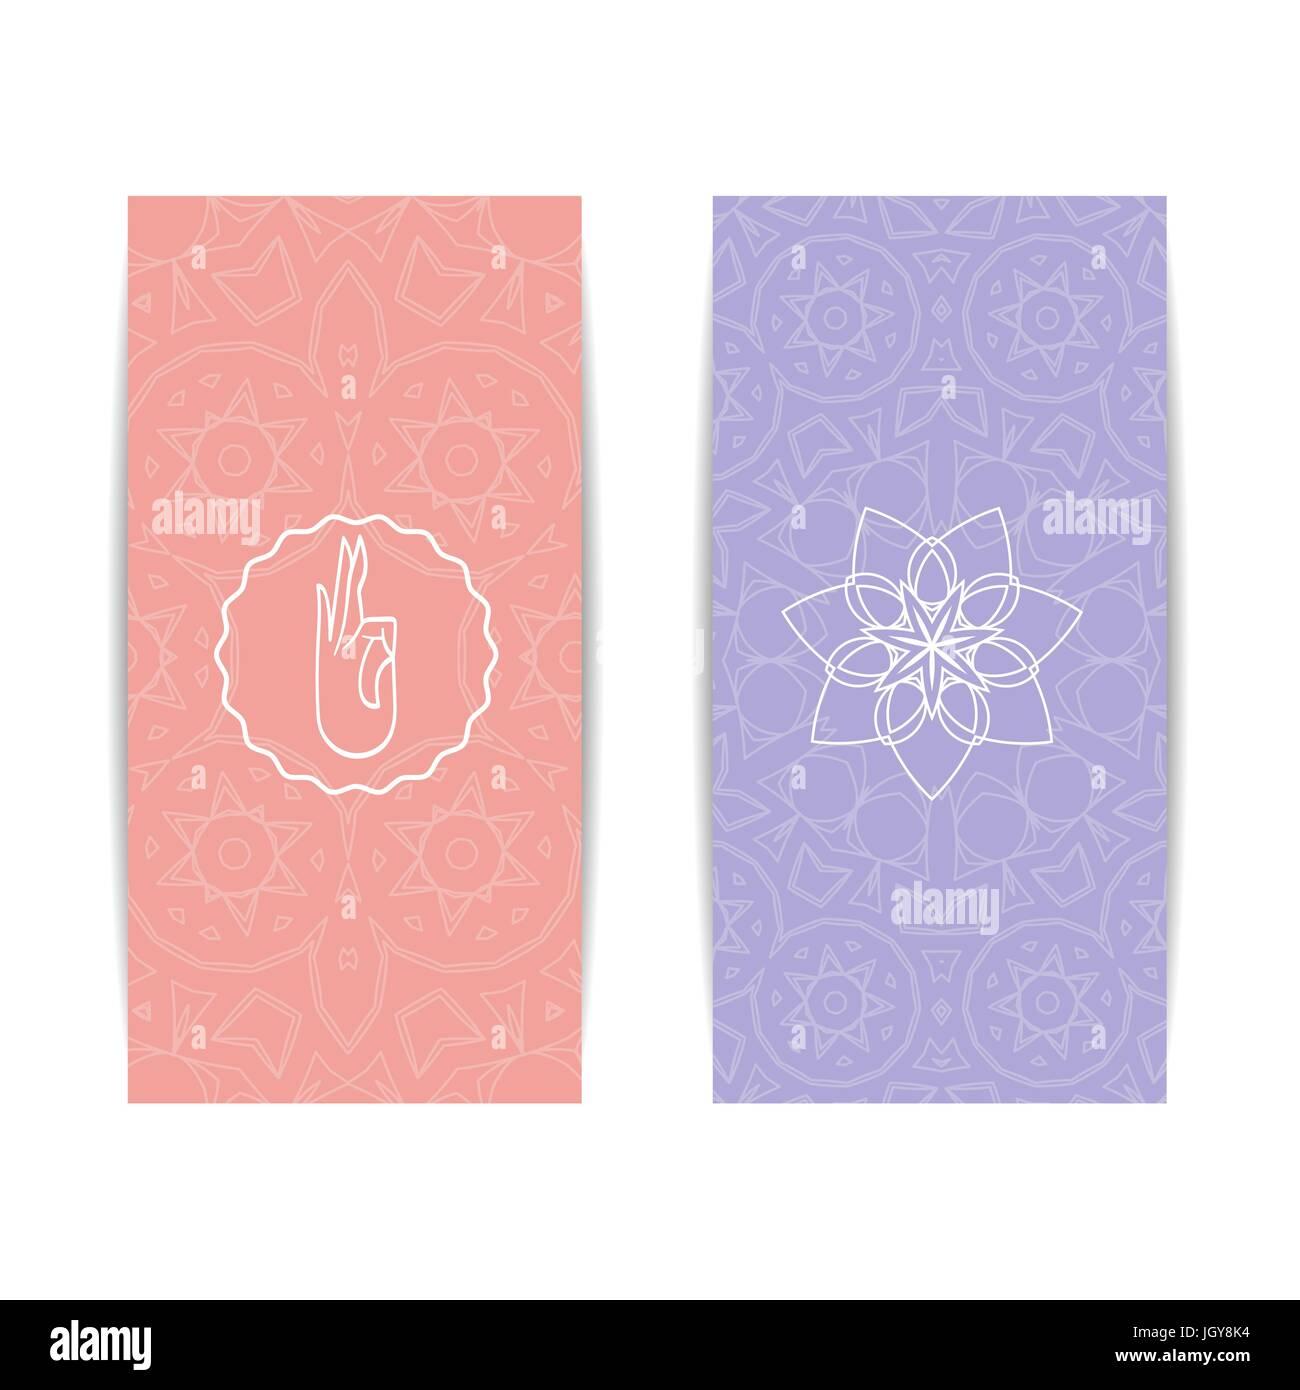 Yoga Banner Template Stockfotos & Yoga Banner Template Bilder - Alamy